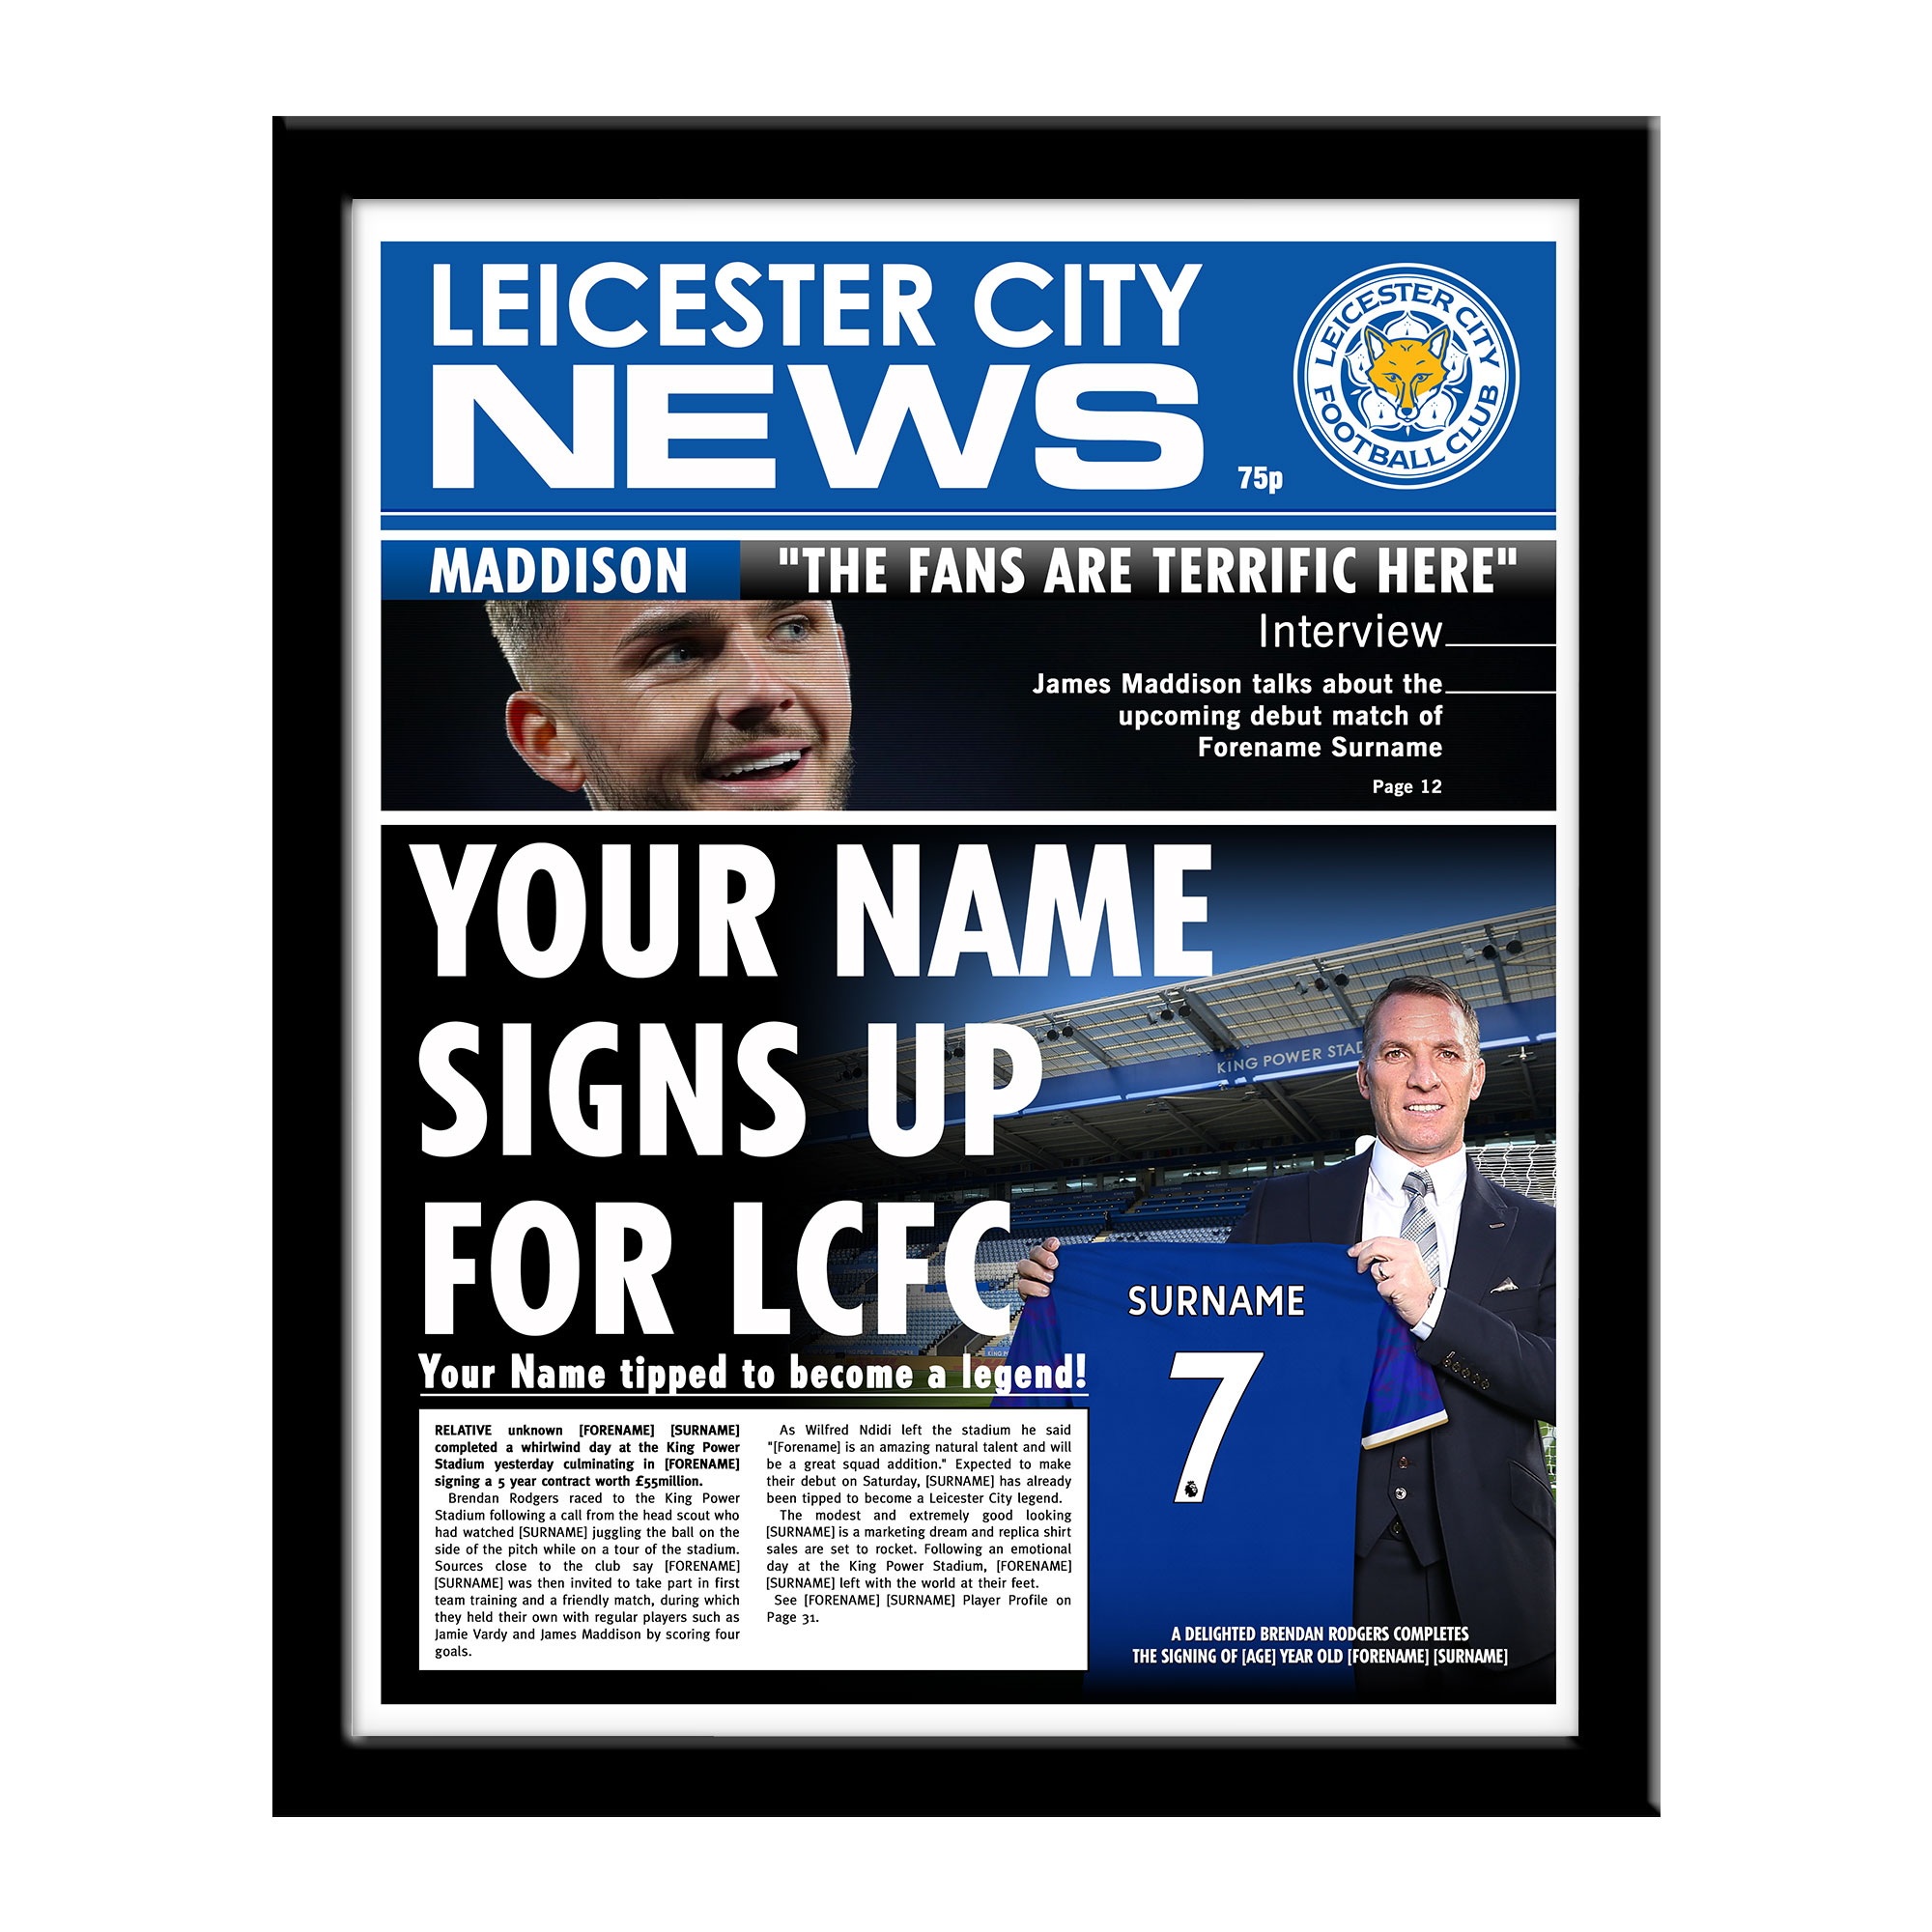 Leicester City FC News